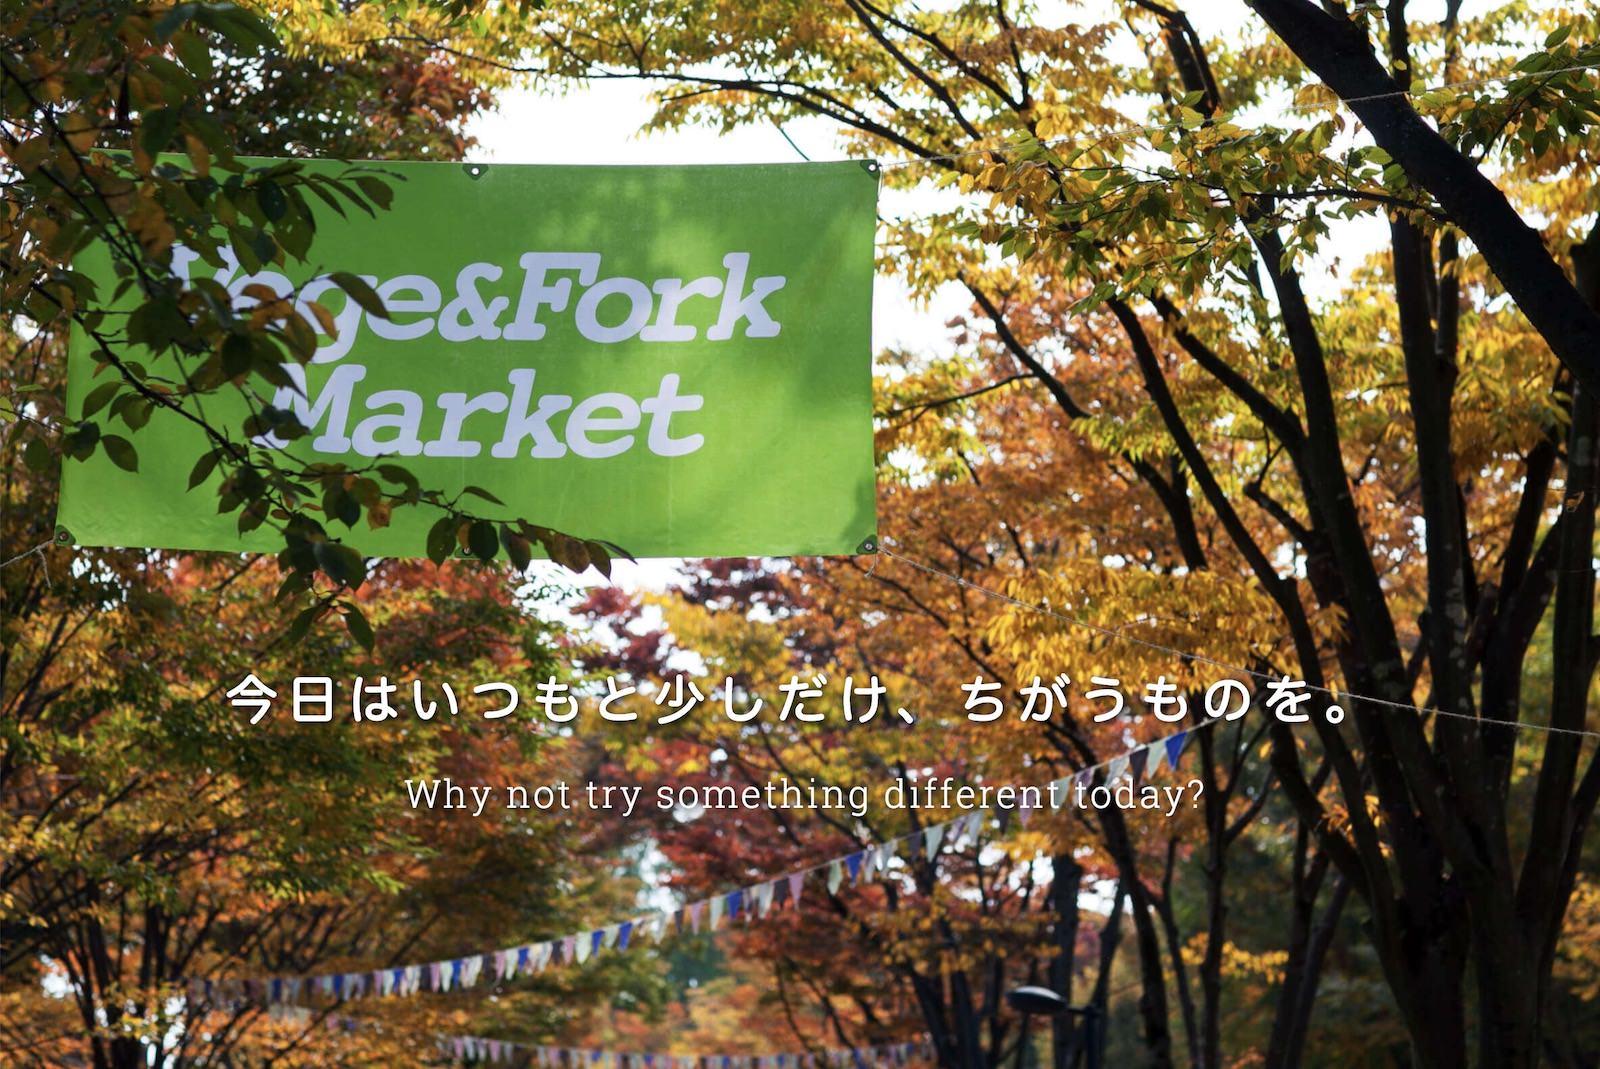 Vege-and-fork-market-top